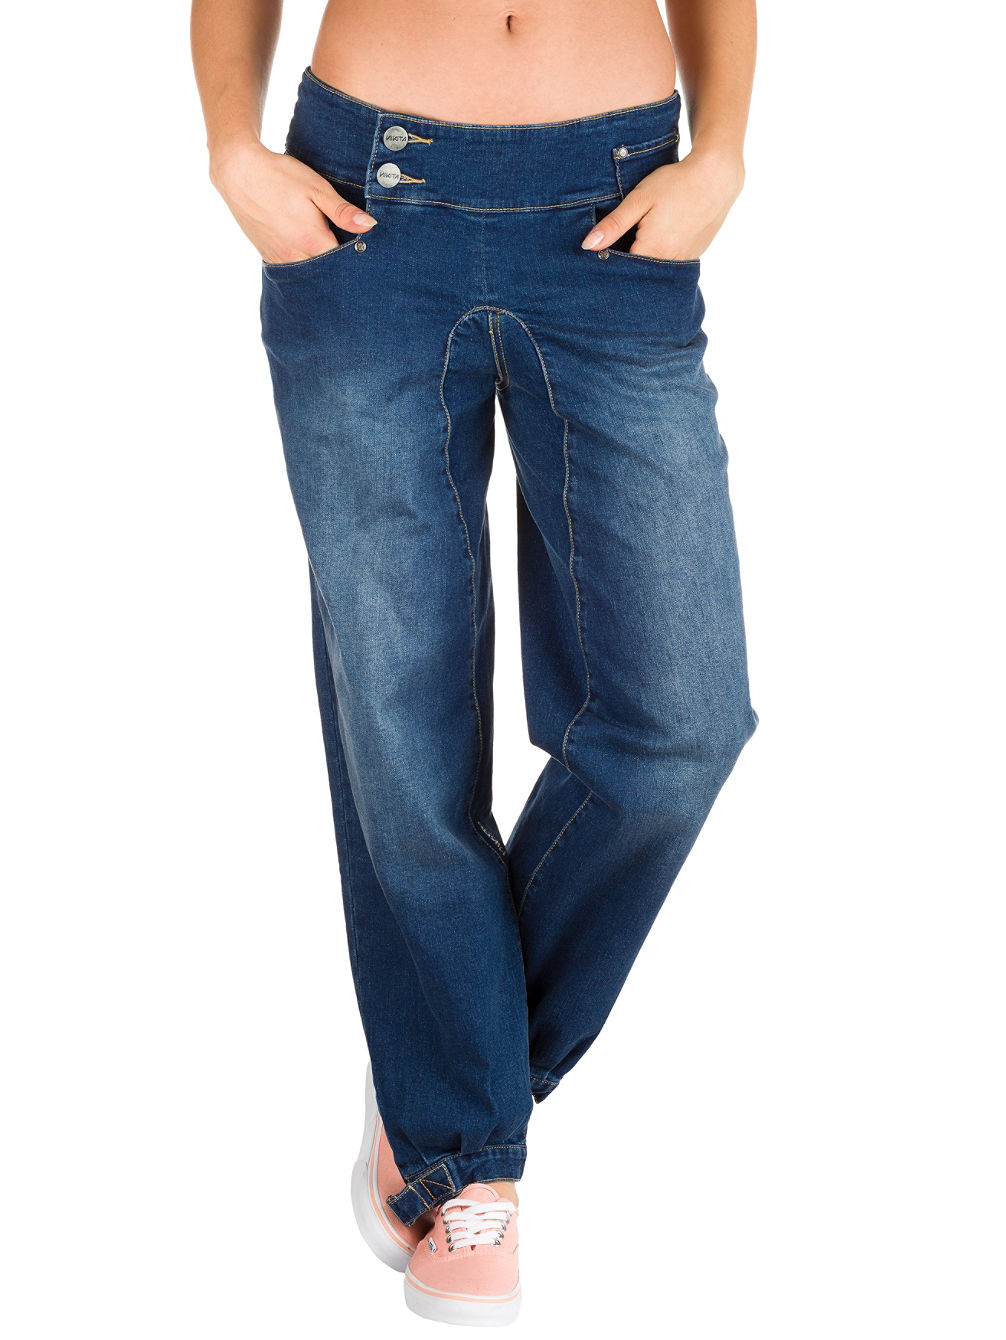 a3094a083 Reality Jeans